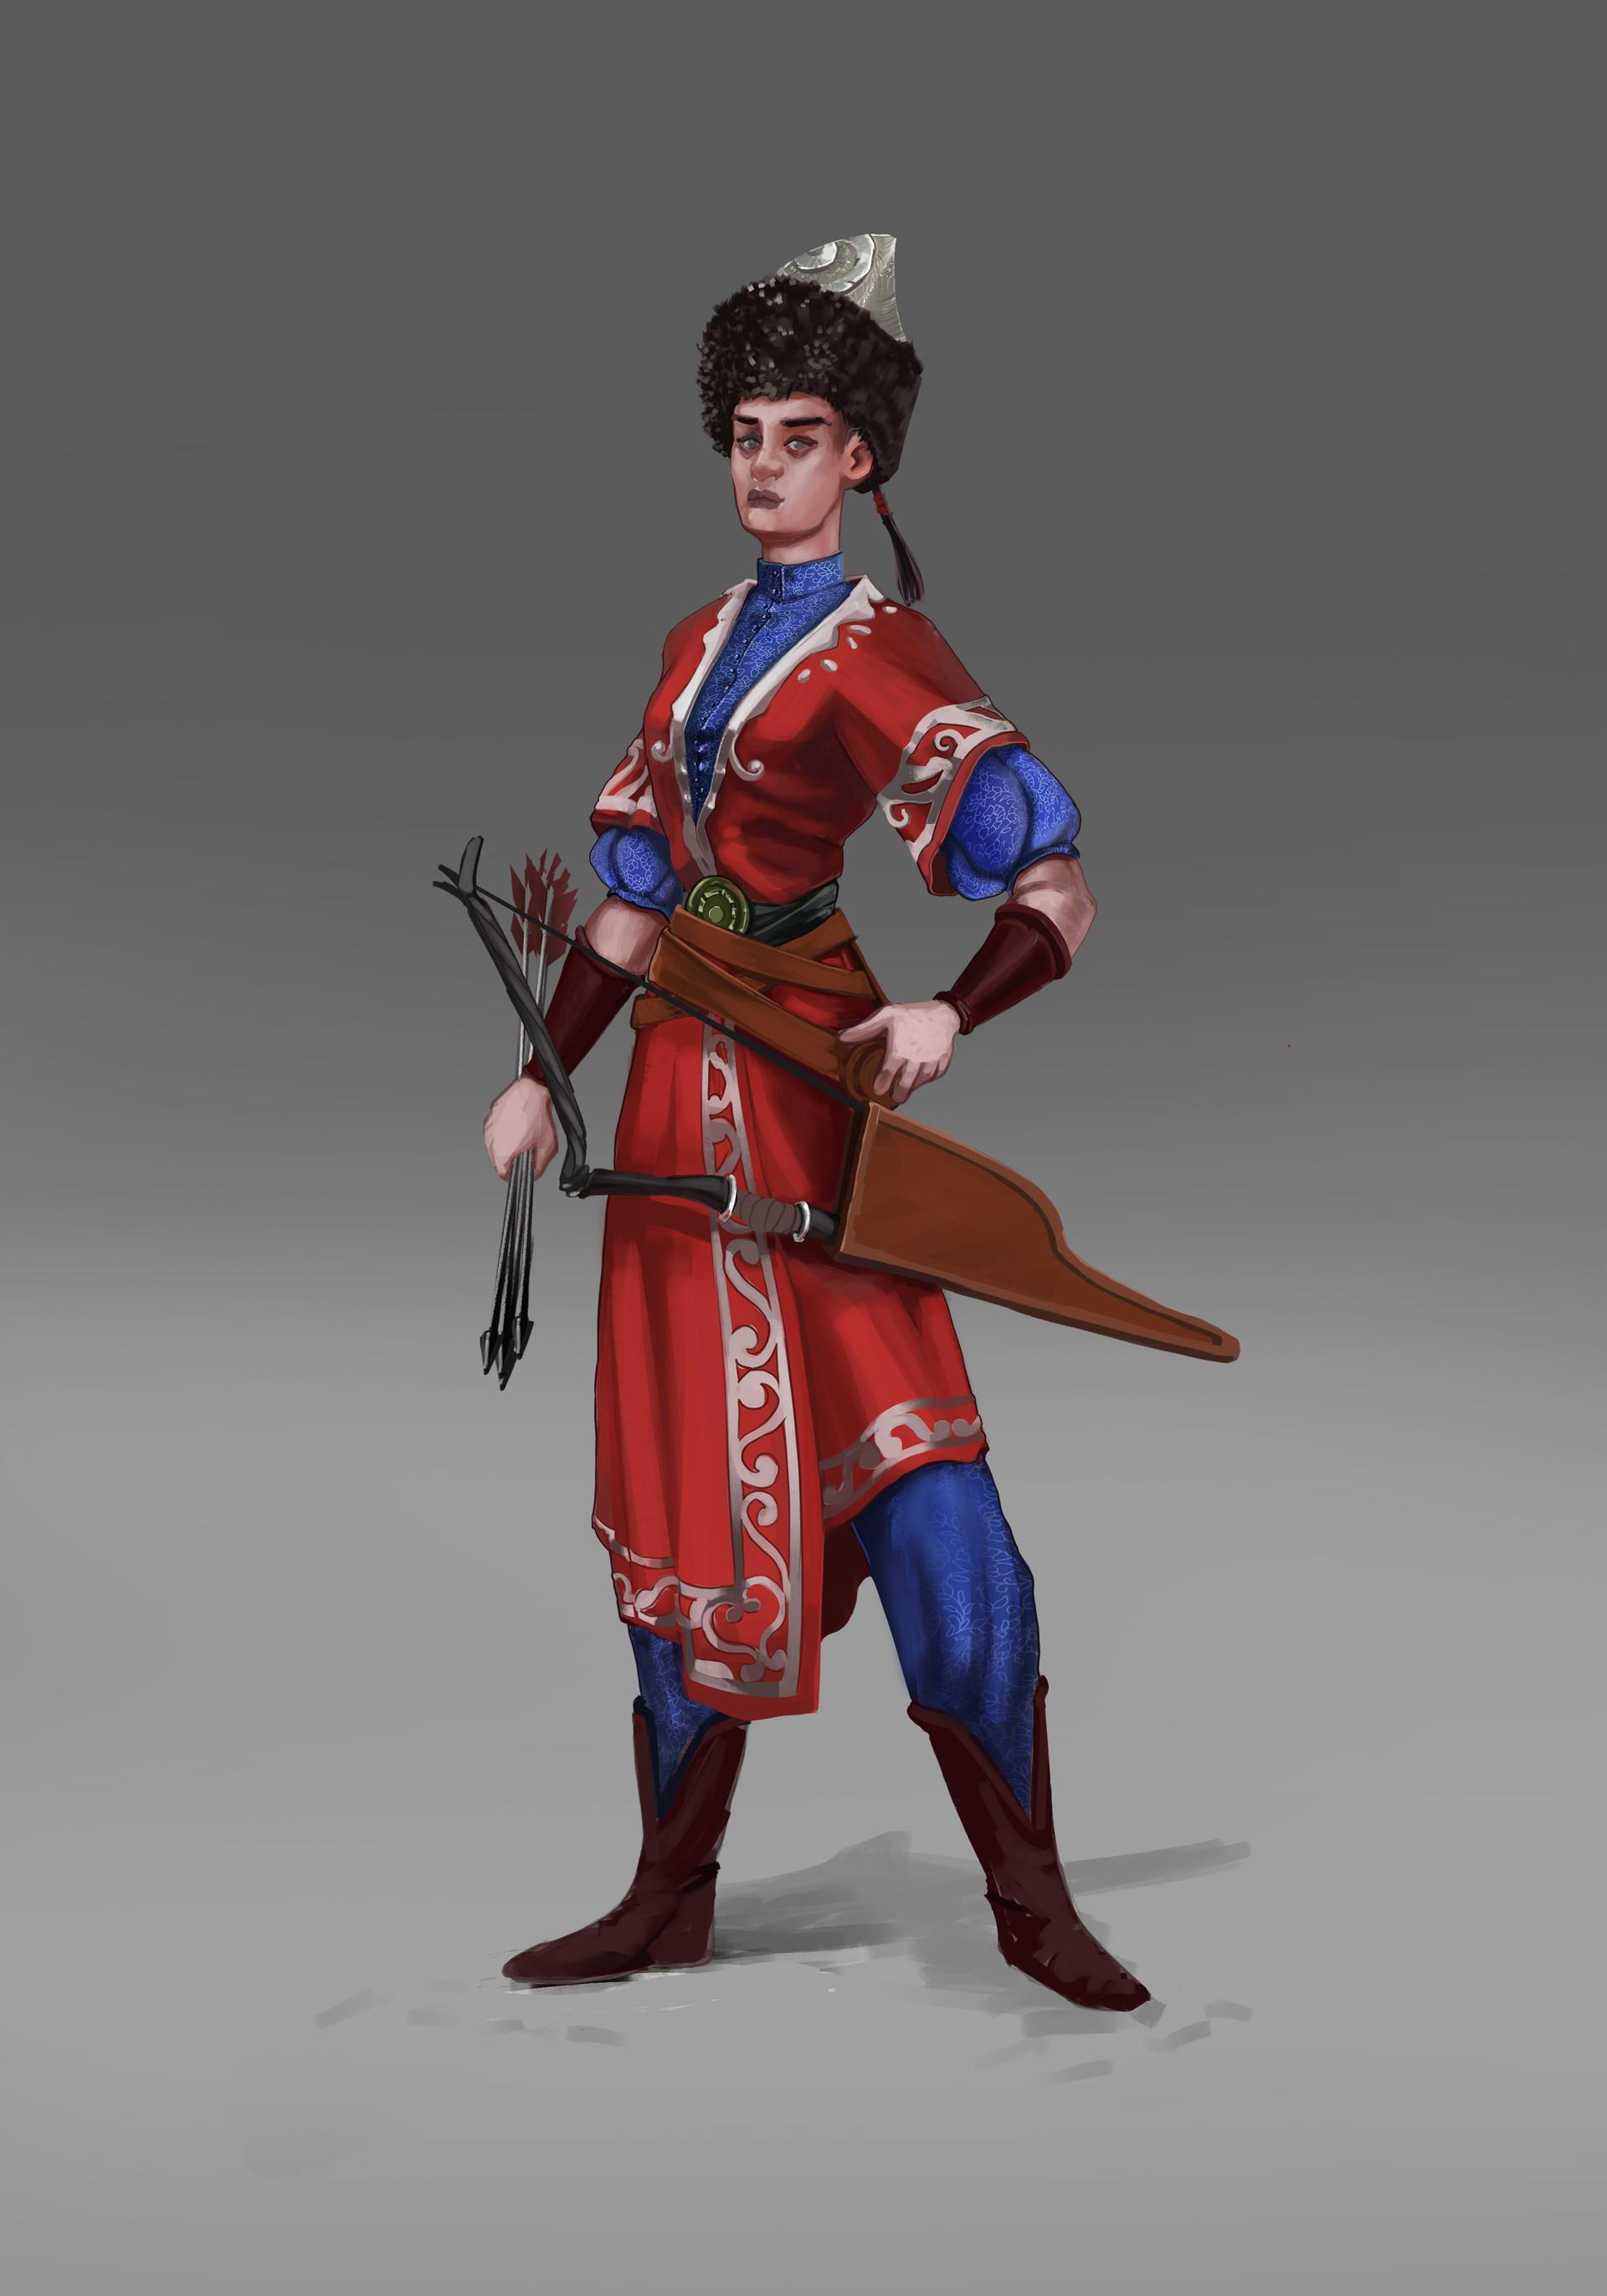 Ramasses romero archer